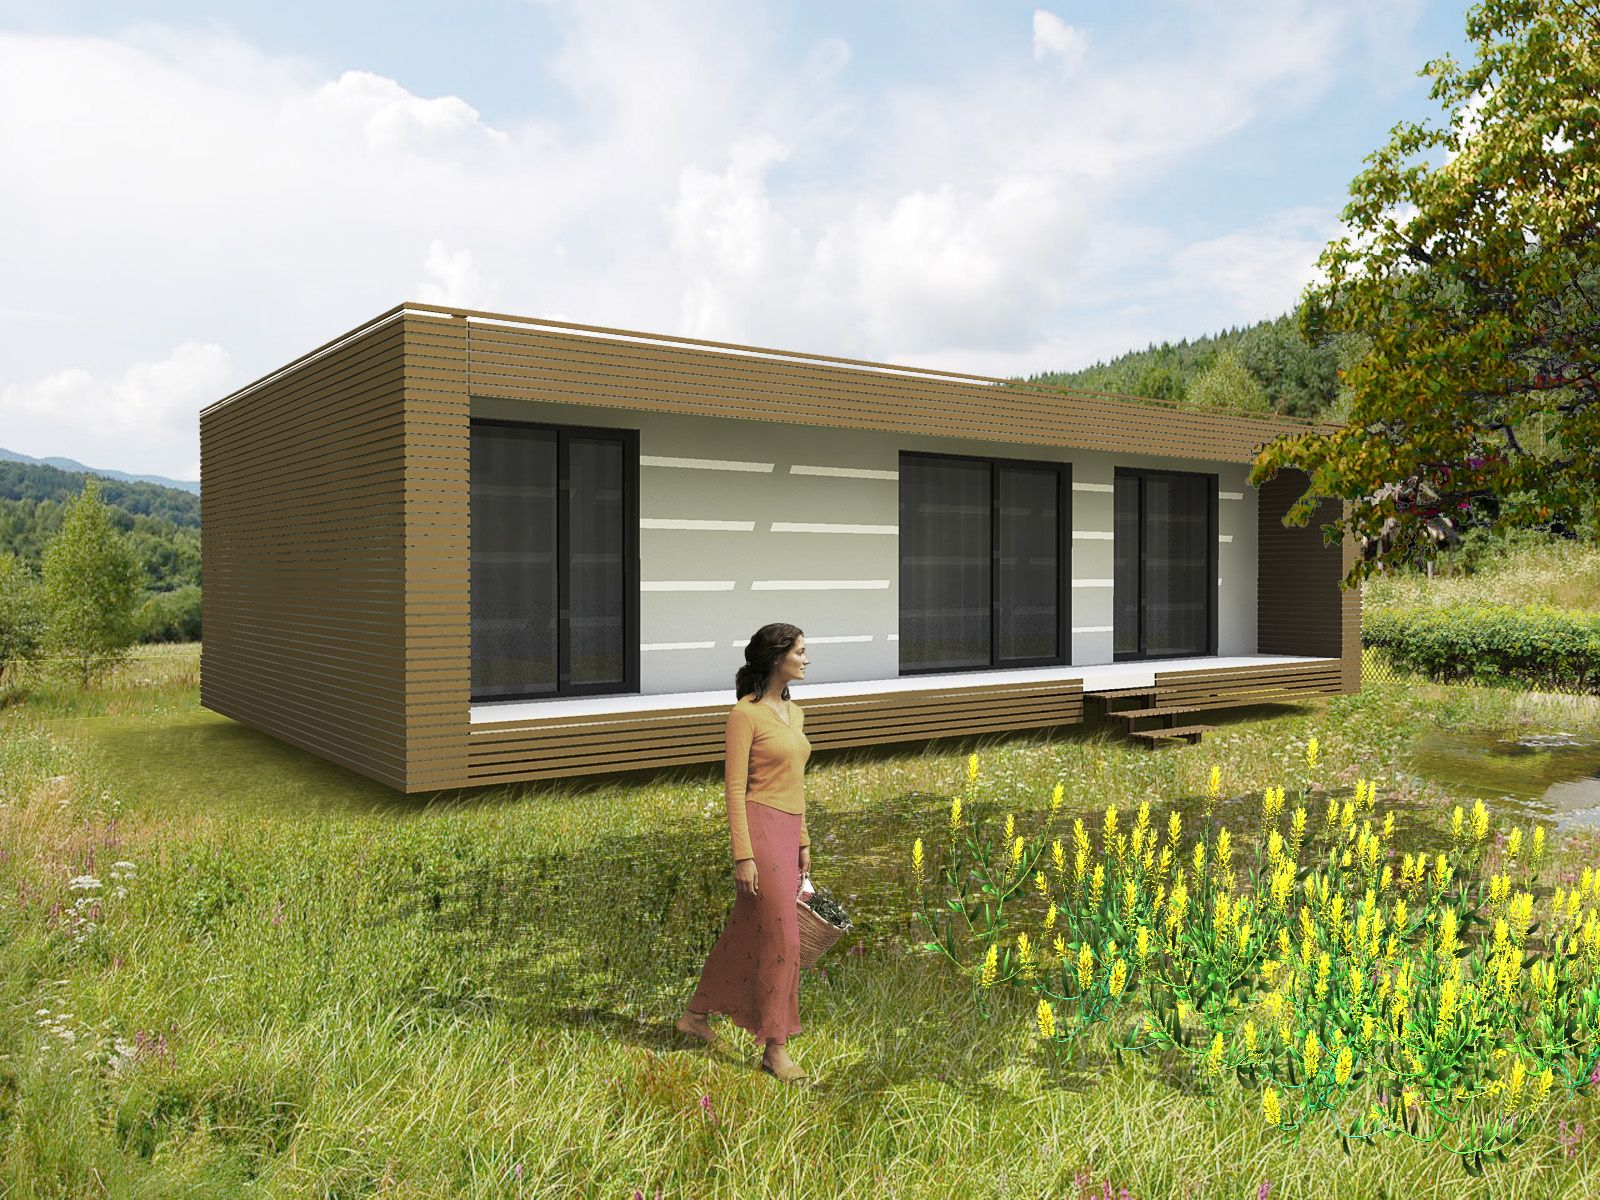 Strange Chic Modern Prefab Homes Dallas With Modern Prefab Homes Home Interior And Landscaping Eliaenasavecom